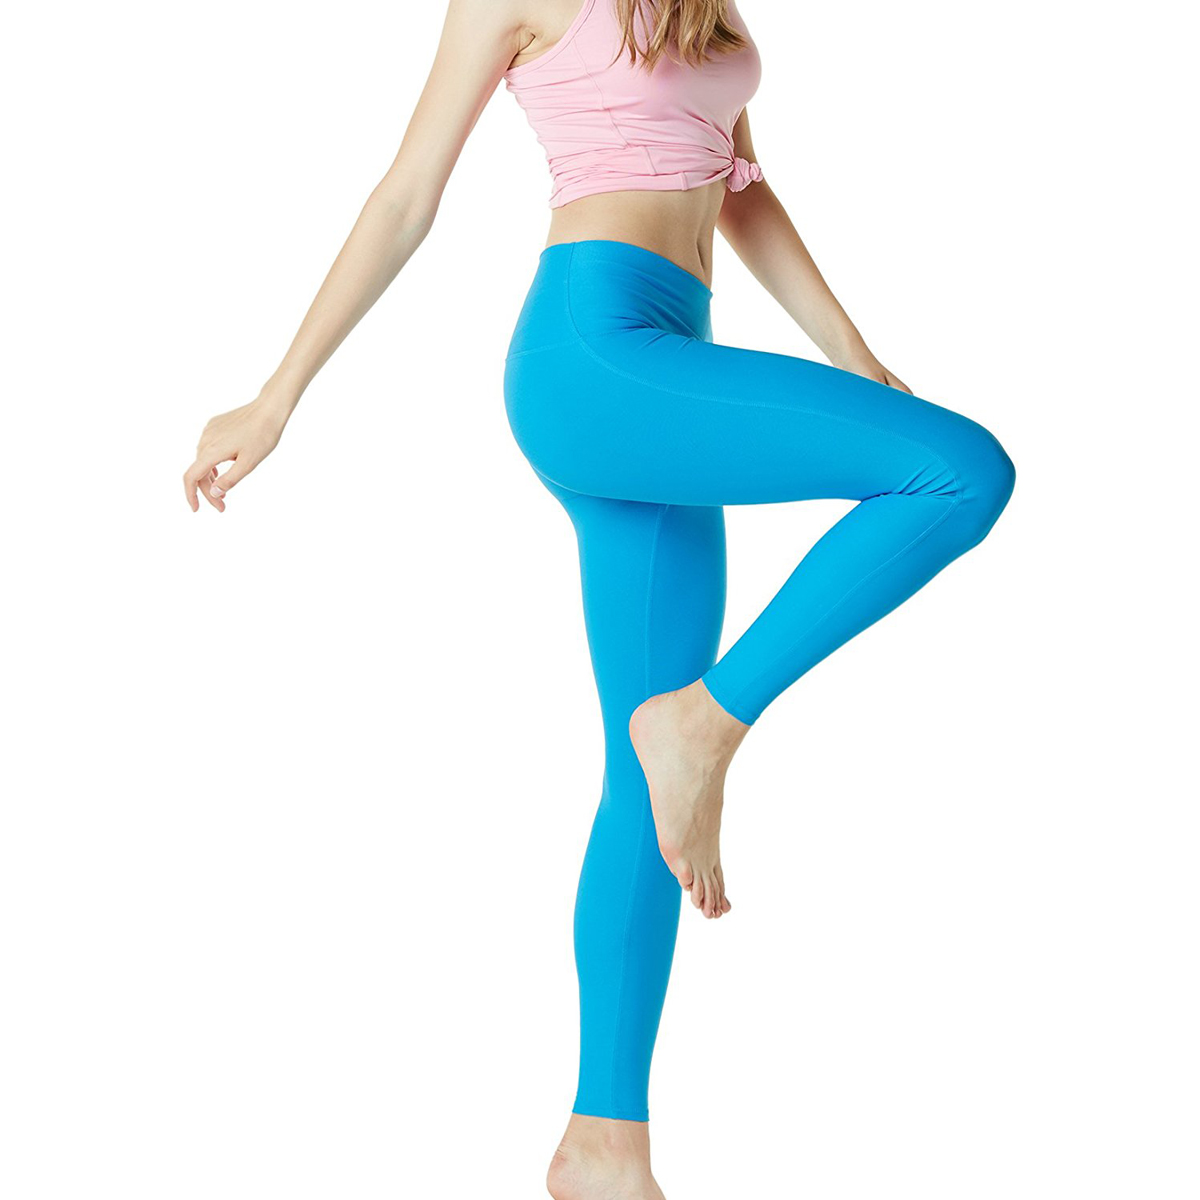 thumbnail 70 - TSLA Tesla FYP42 Women's High-Waisted Ultra-Stretch Tummy Control Yoga Pants